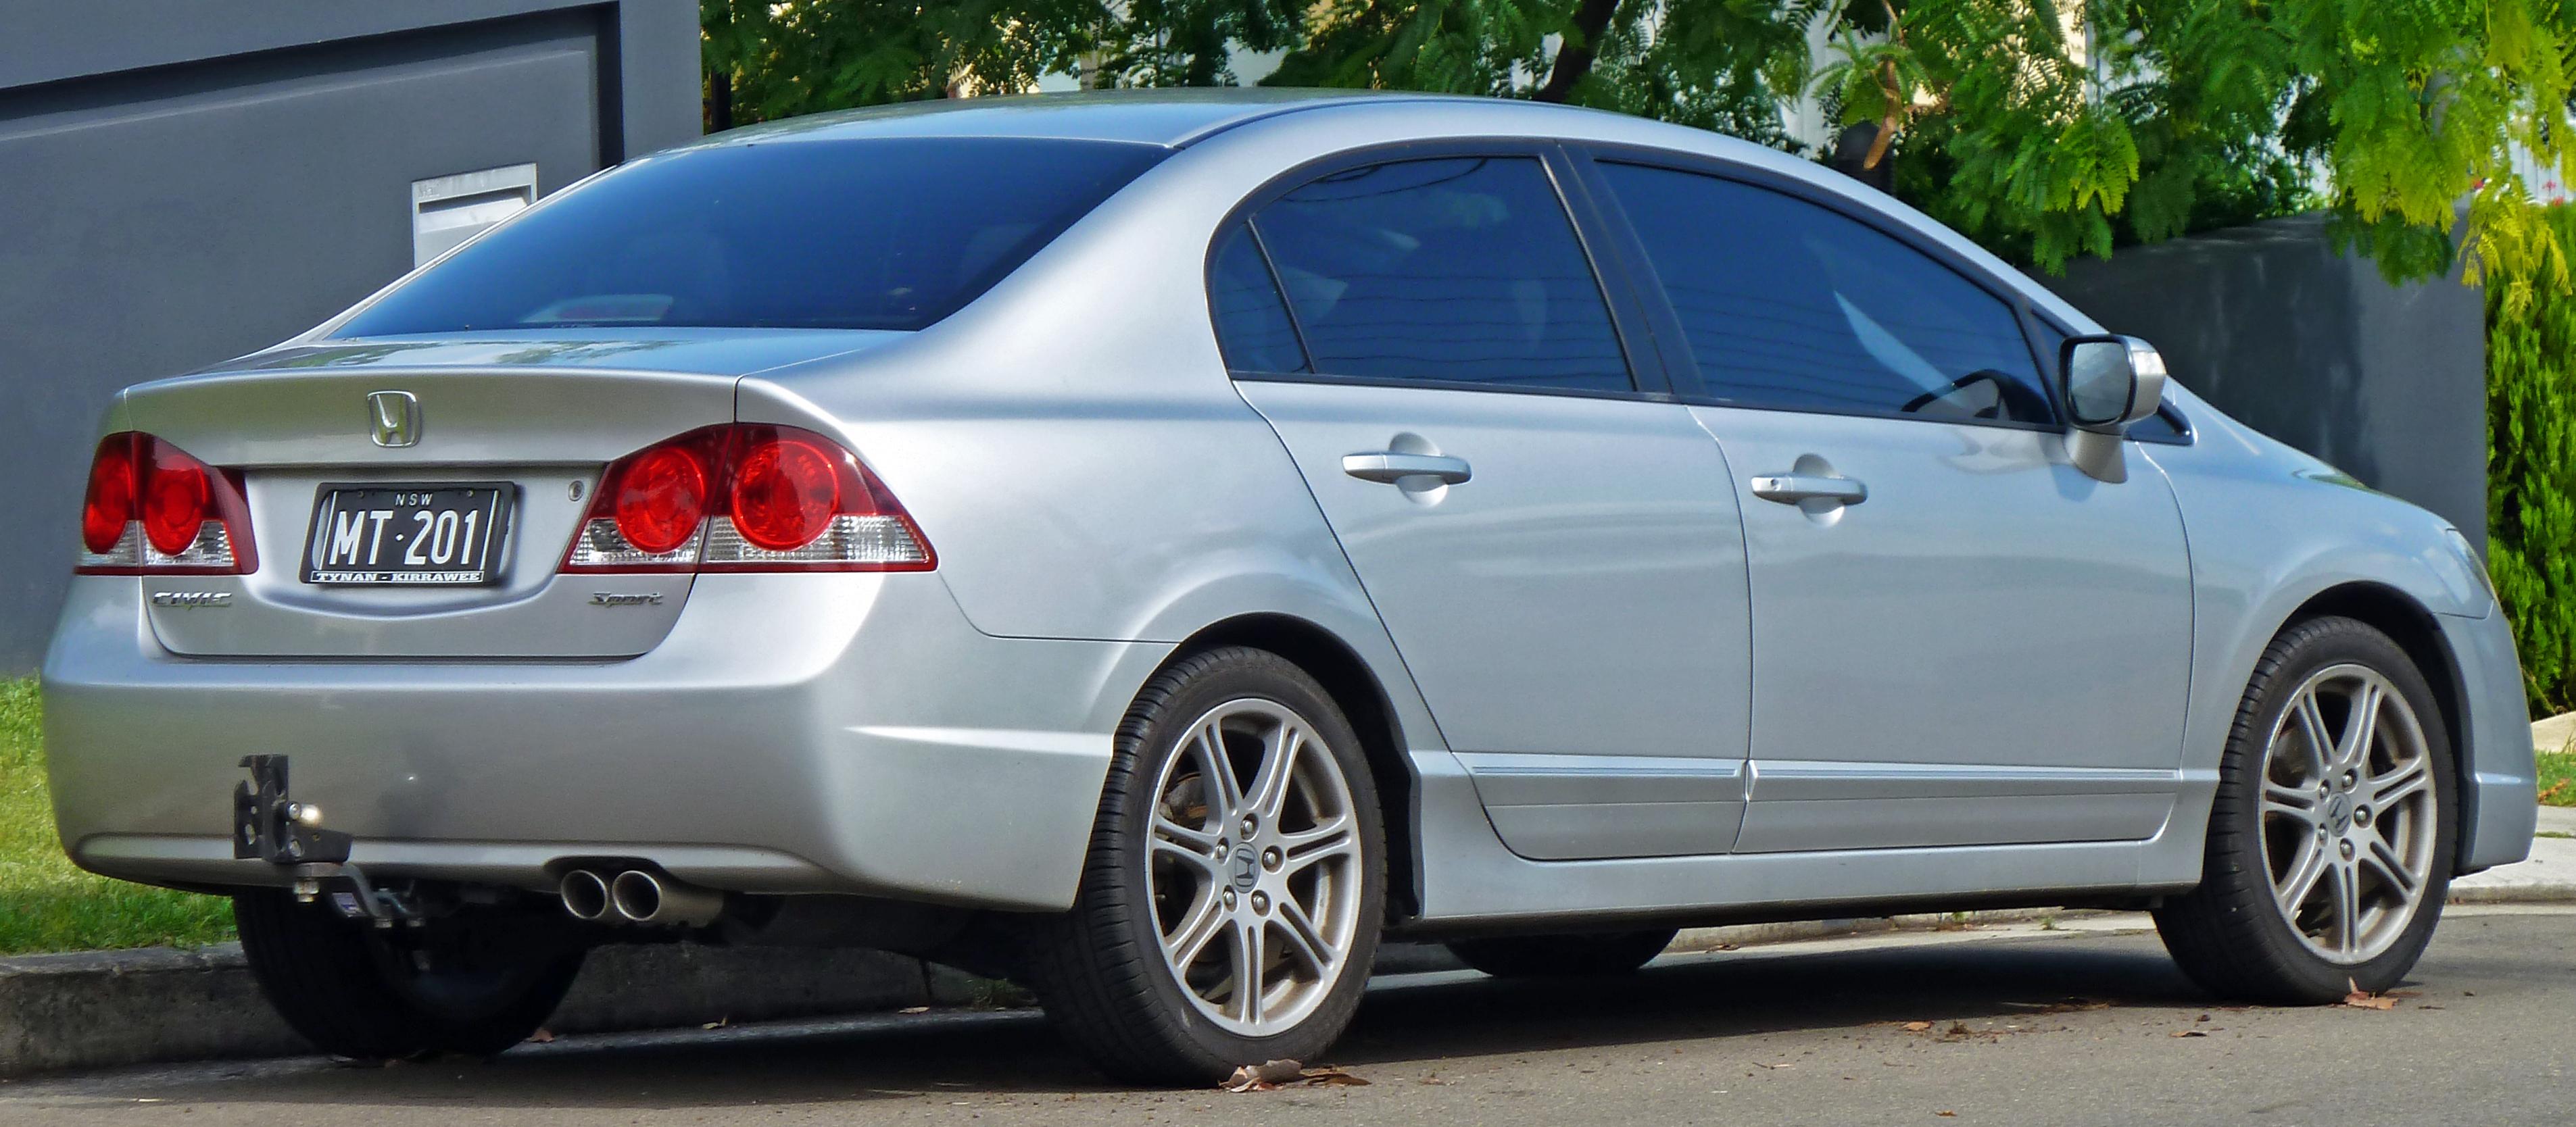 File:2006 2009 Honda Civic Sport Sedan (2010 12 17)